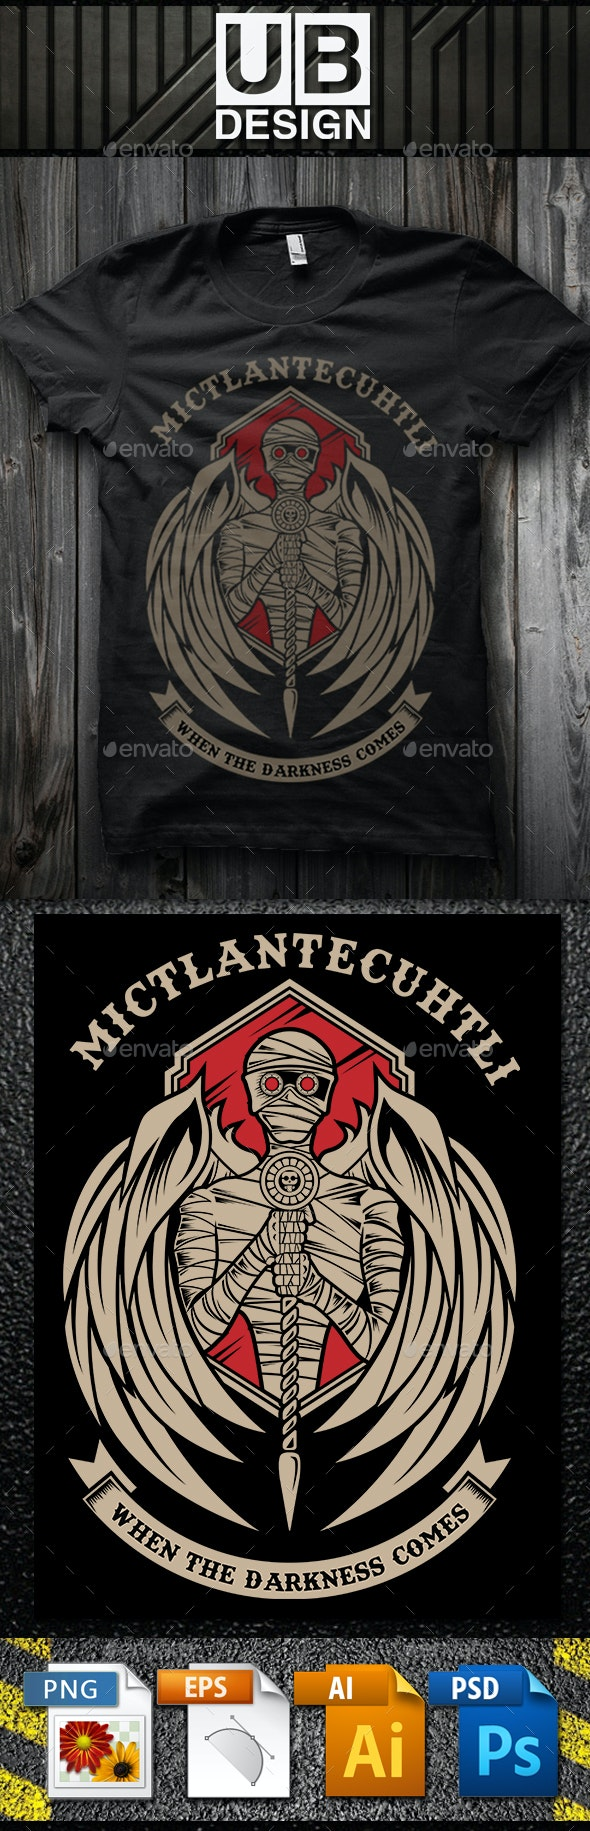 Mictlantecuhtli - Designs T-Shirts